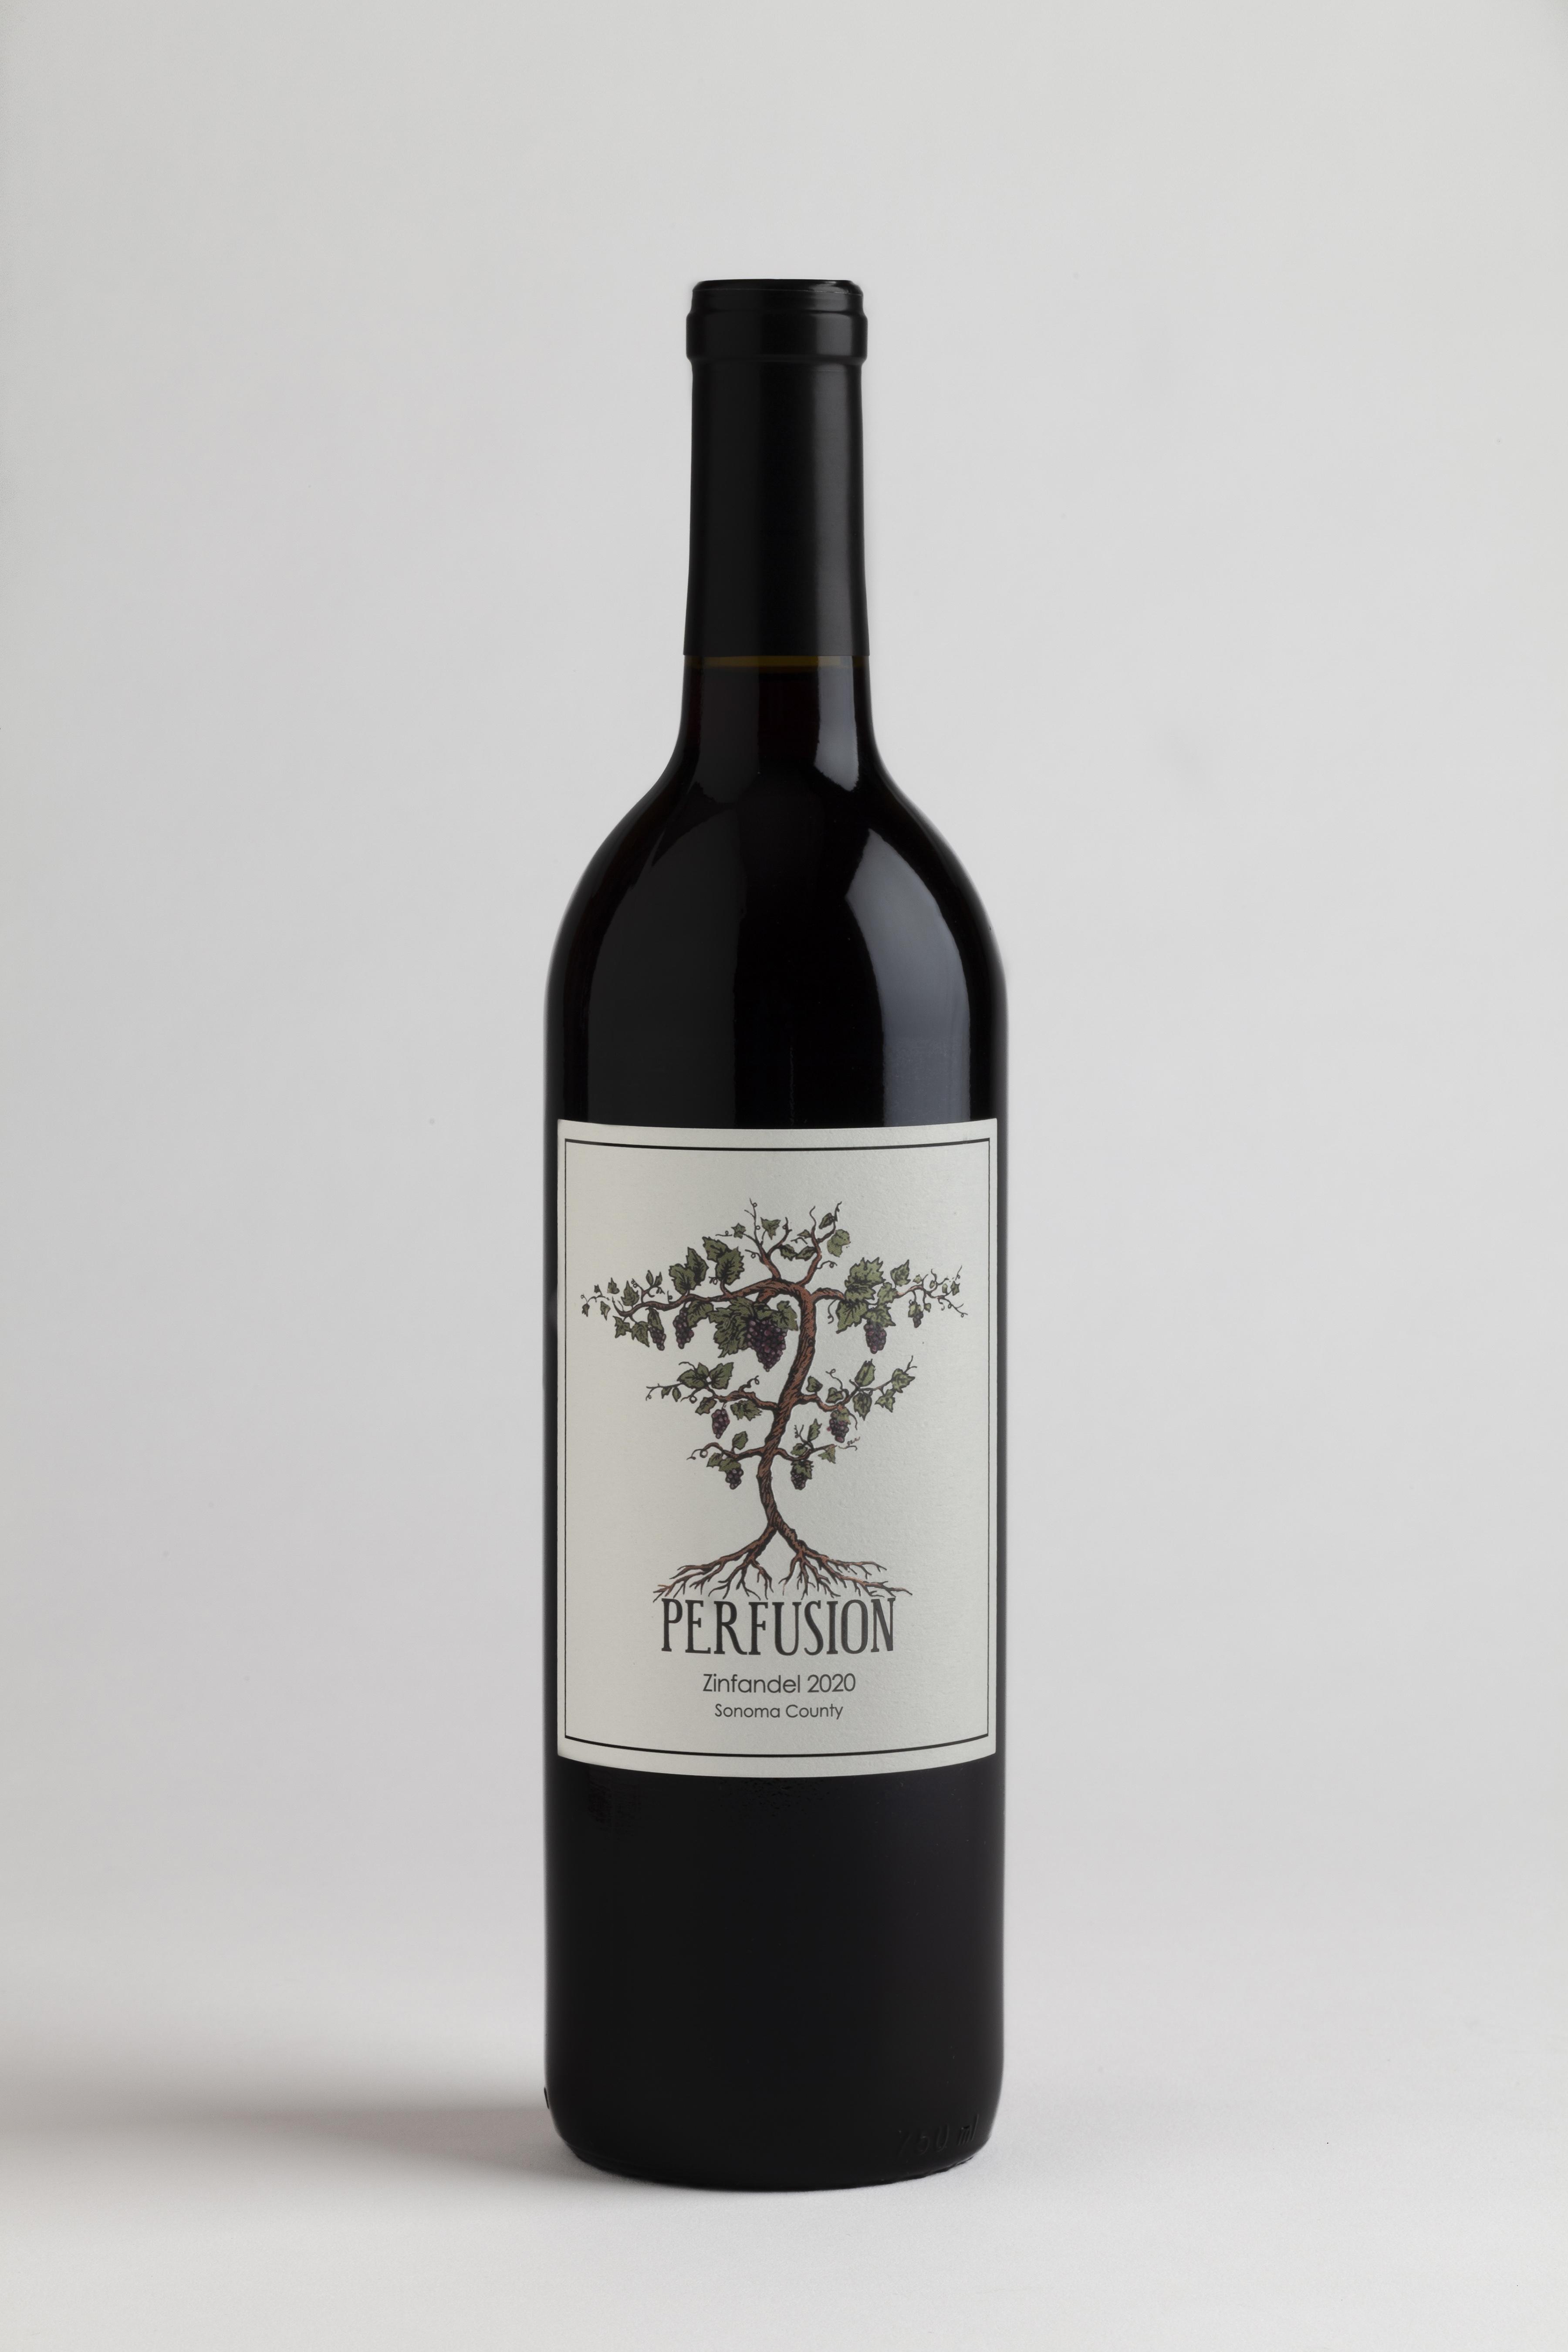 2020 Perfusion Vineyard Sonoma Zinfandel 00014